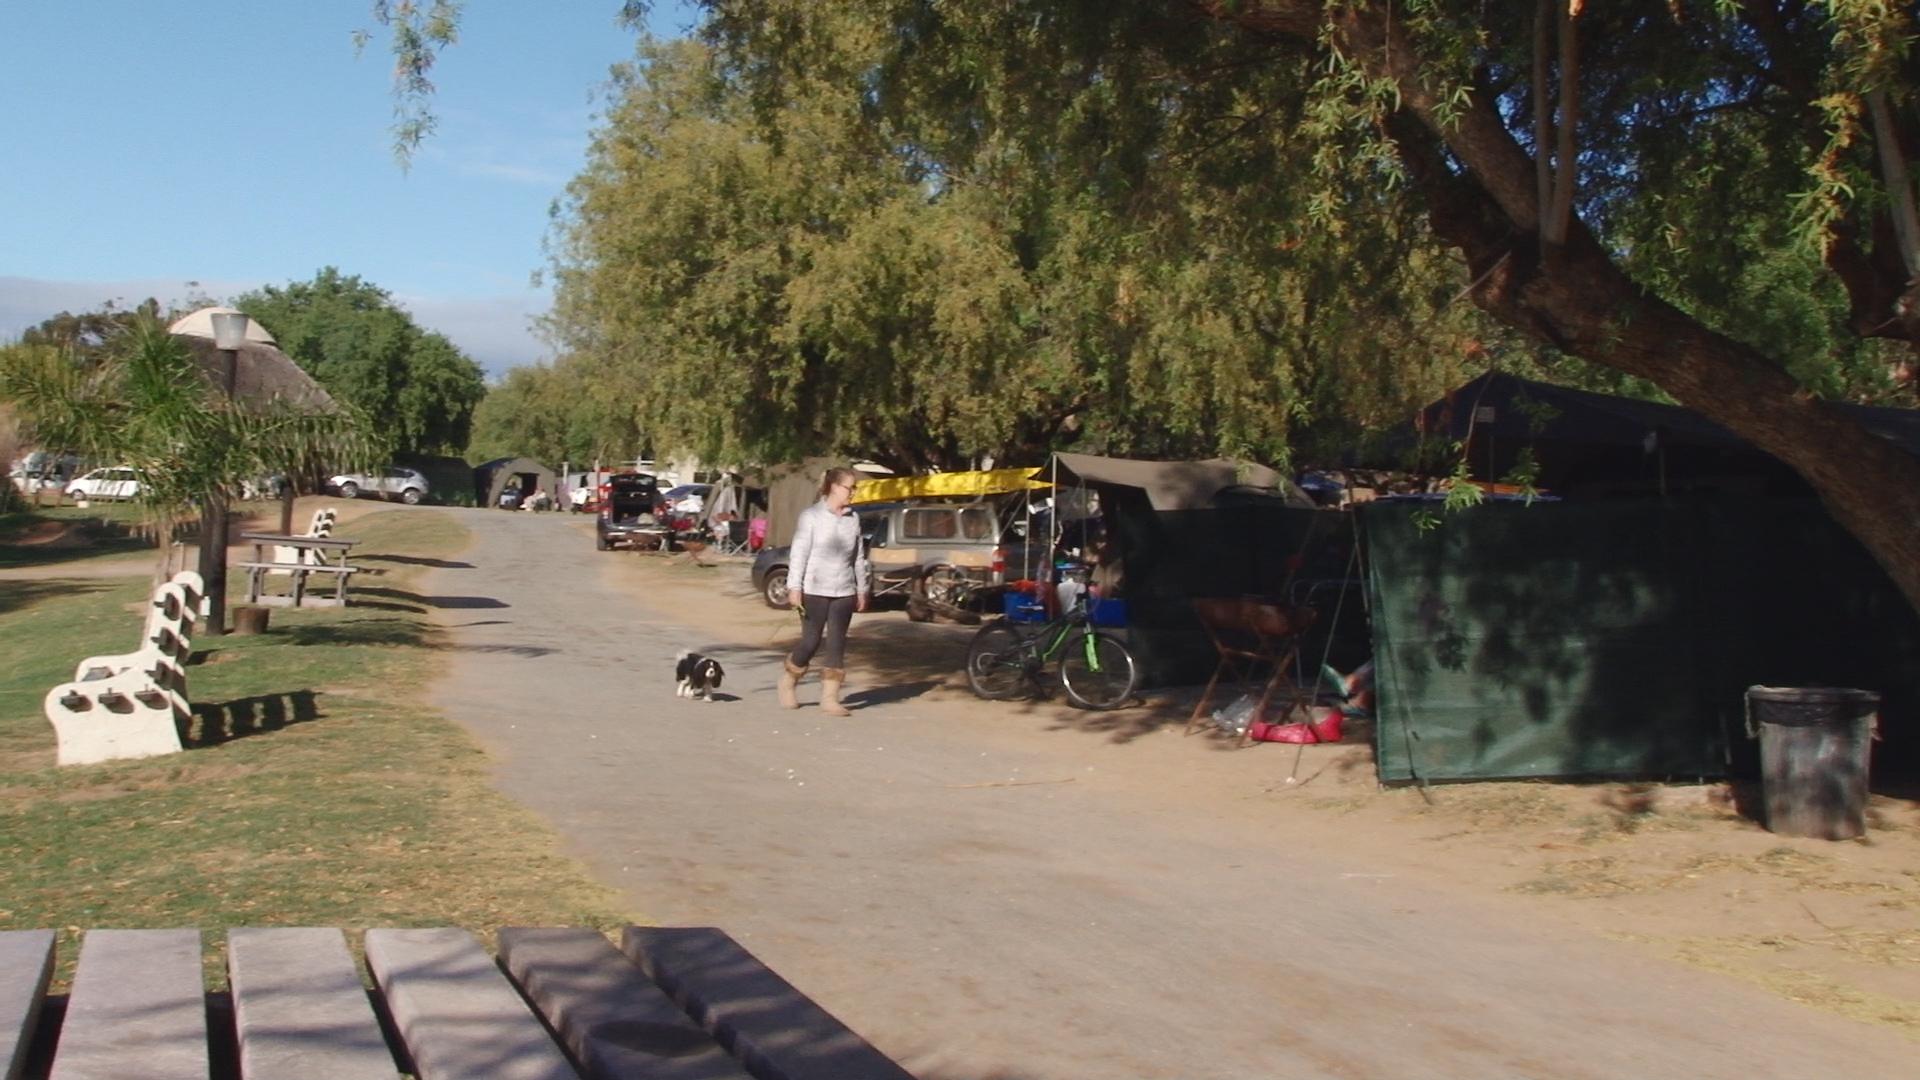 Silwerstrand Caravan Park